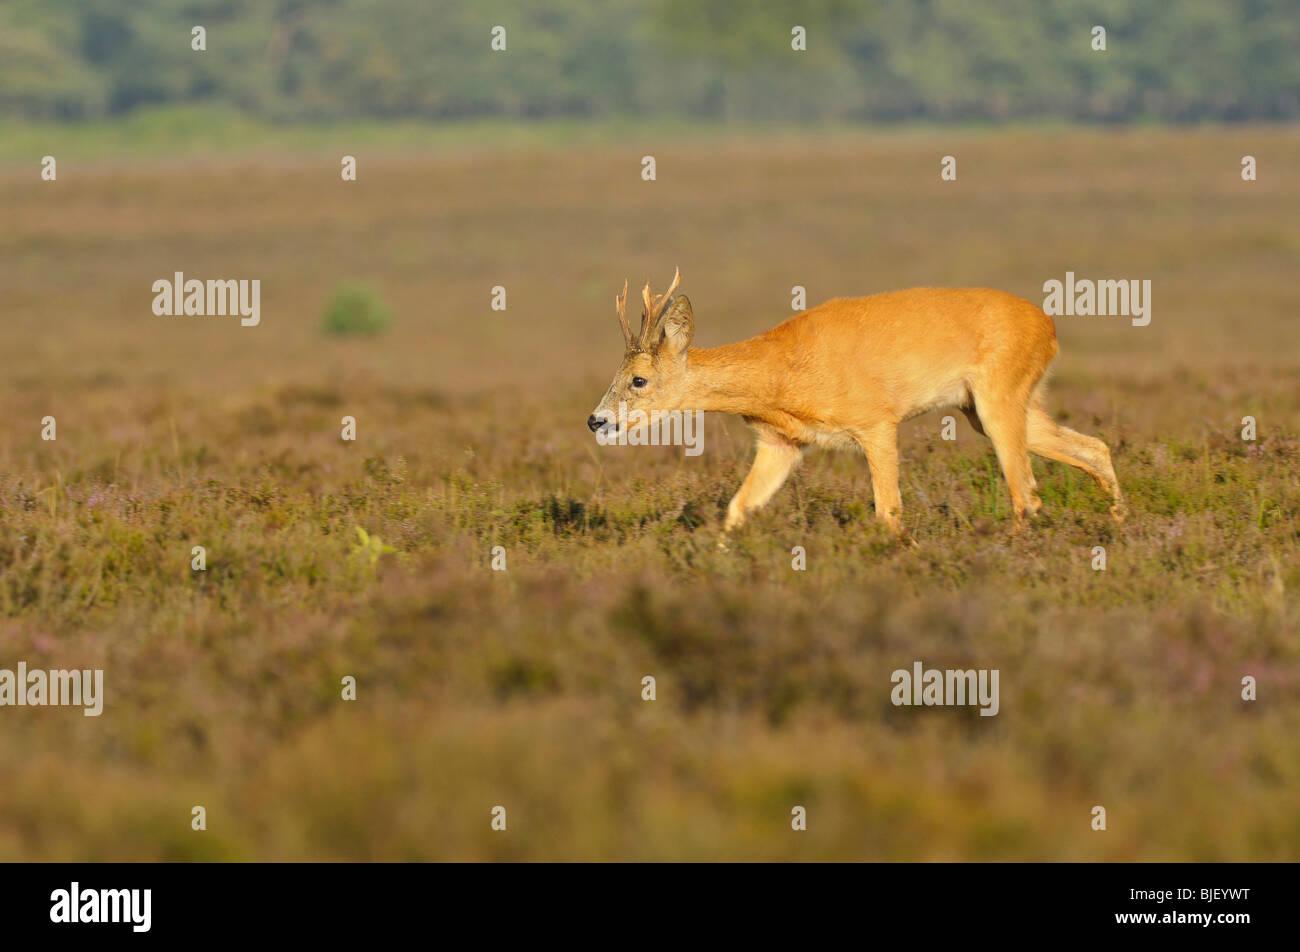 European Roe Deer (Capreolus capreolus), buck searching for doe in rut, Netherlands. - Stock Image